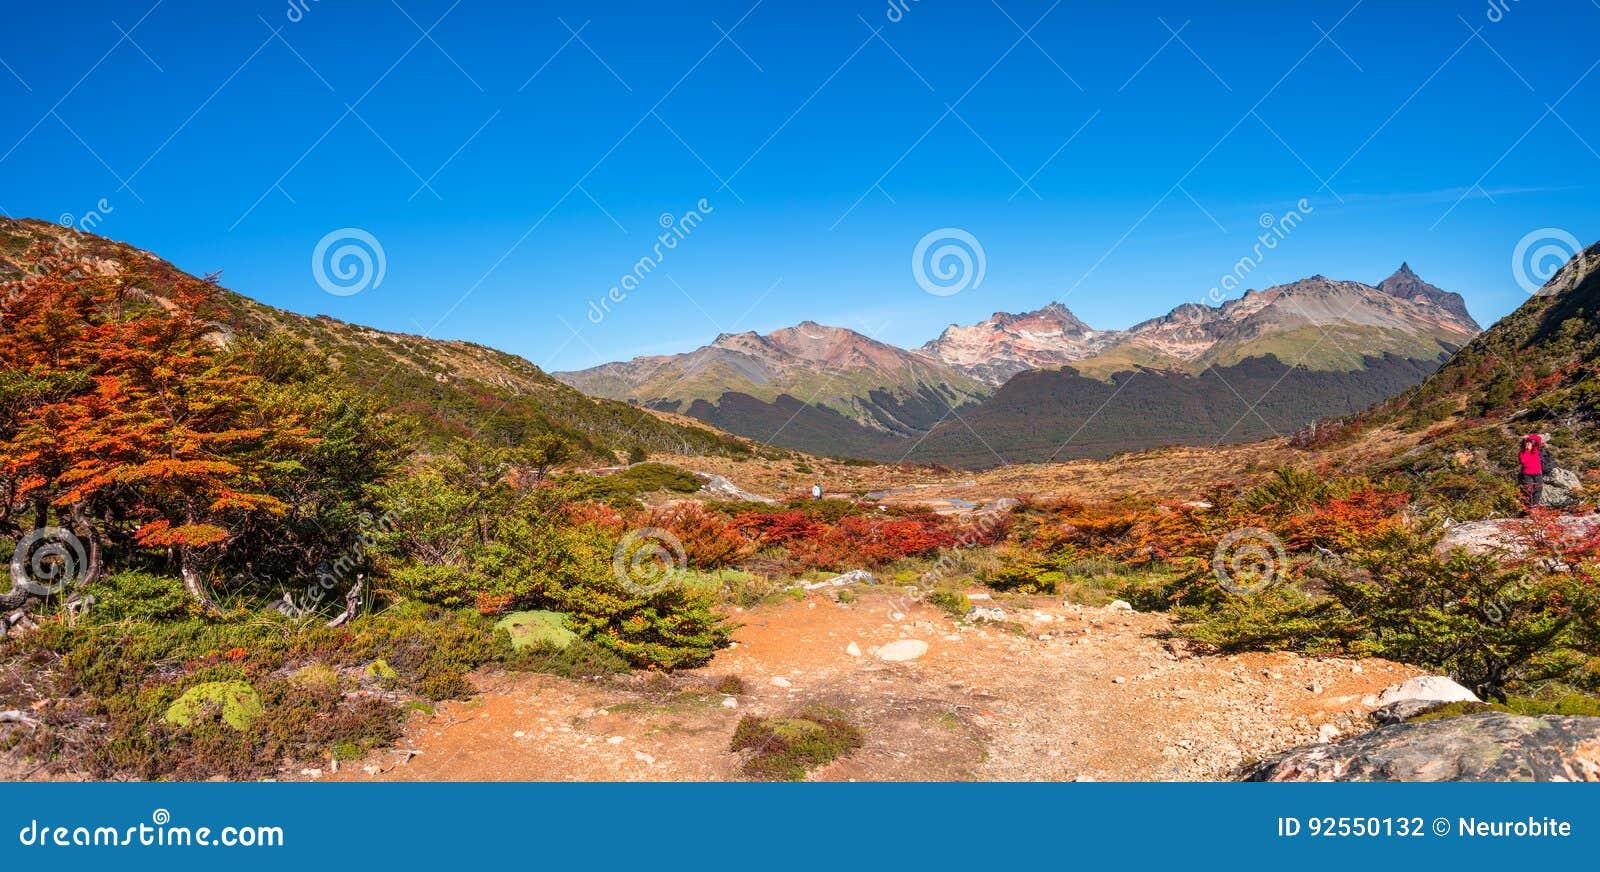 Paesaggio panoramico di Tierra del Fuego National Park, Patagonia